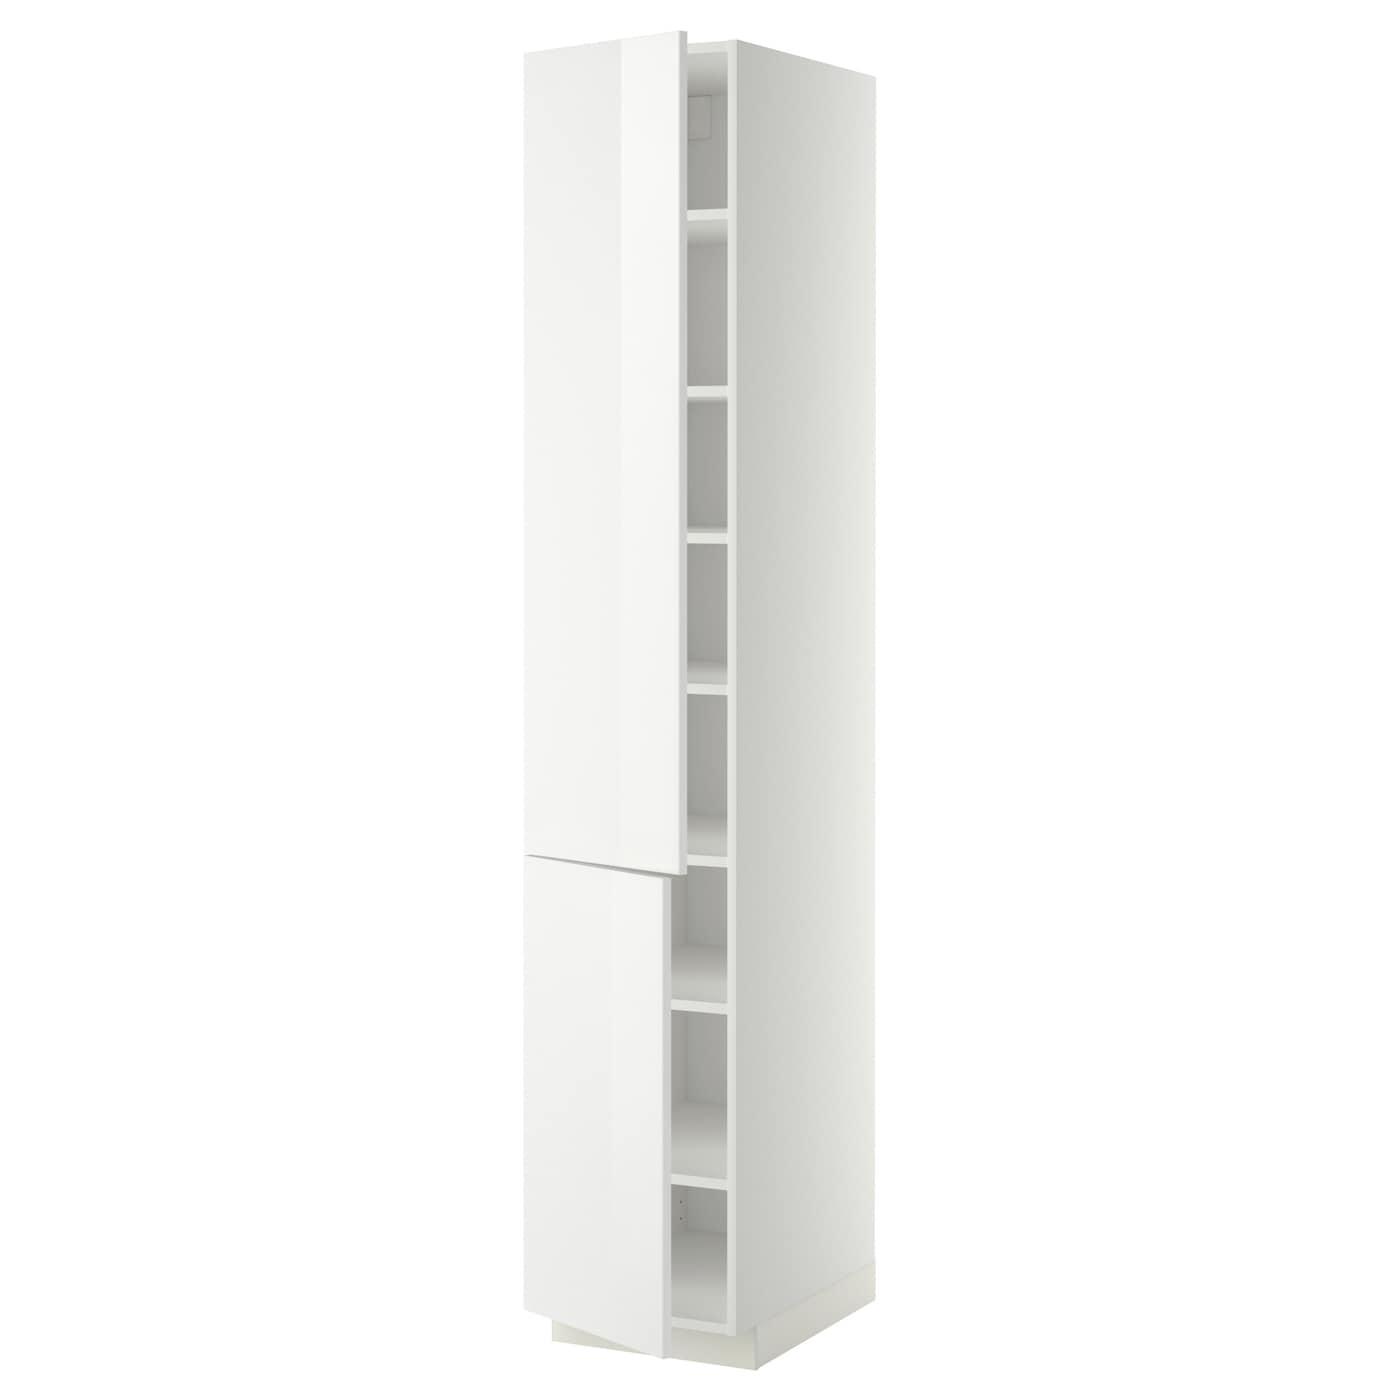 Metod high cabinet with shelves 2 doors white ringhult - Ikea mueble de cocina ...